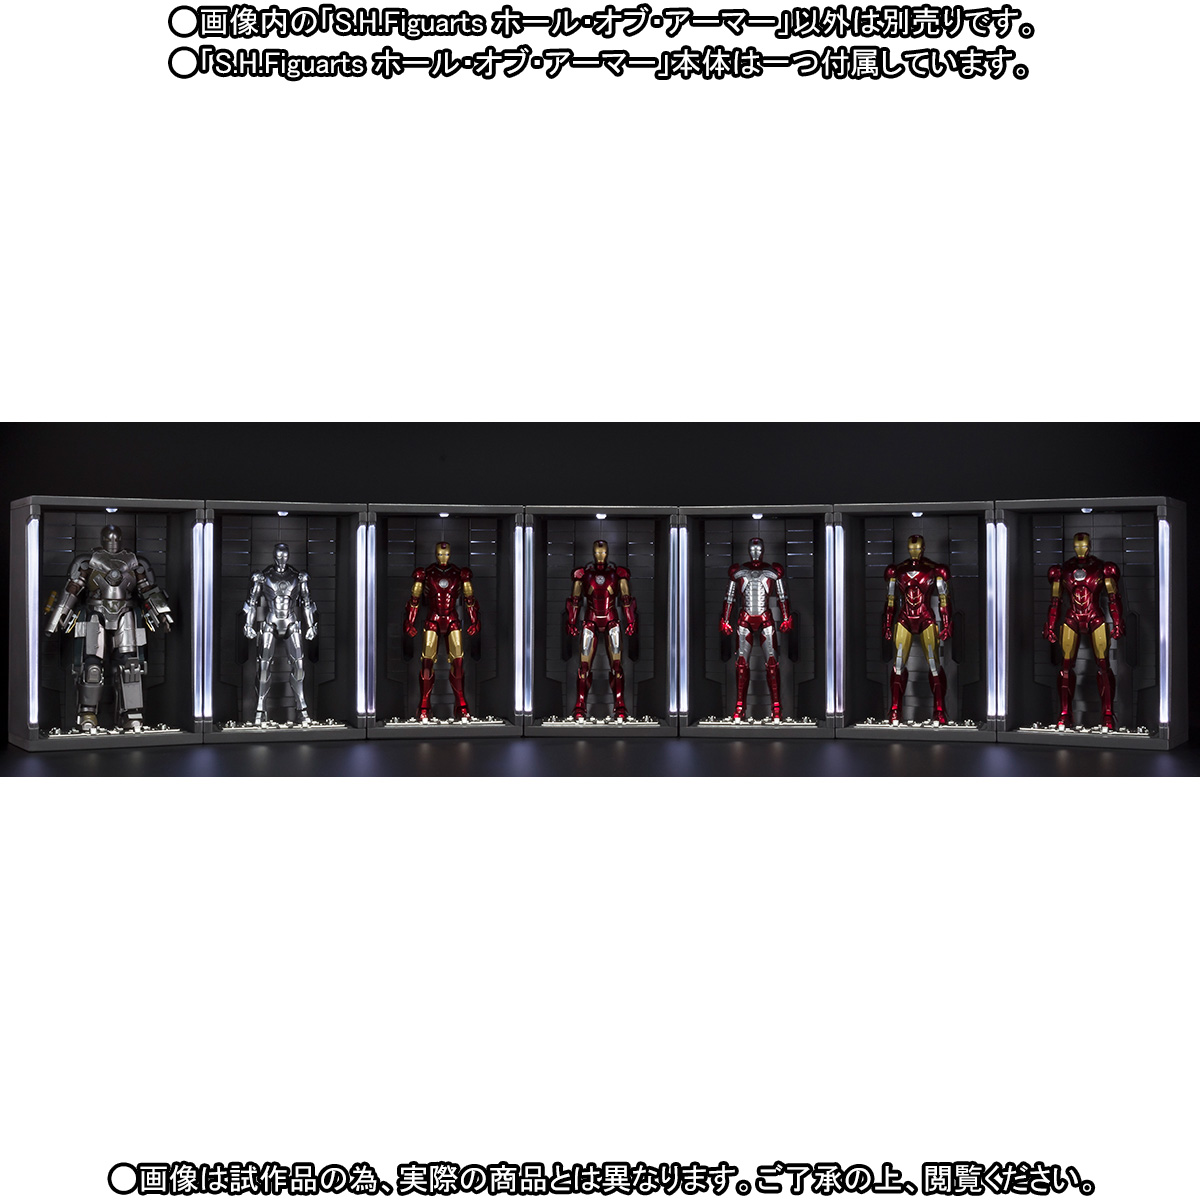 Tamashii Nations Announces S.H. Figuarts Iron Man 3 Hall Of Armor Display